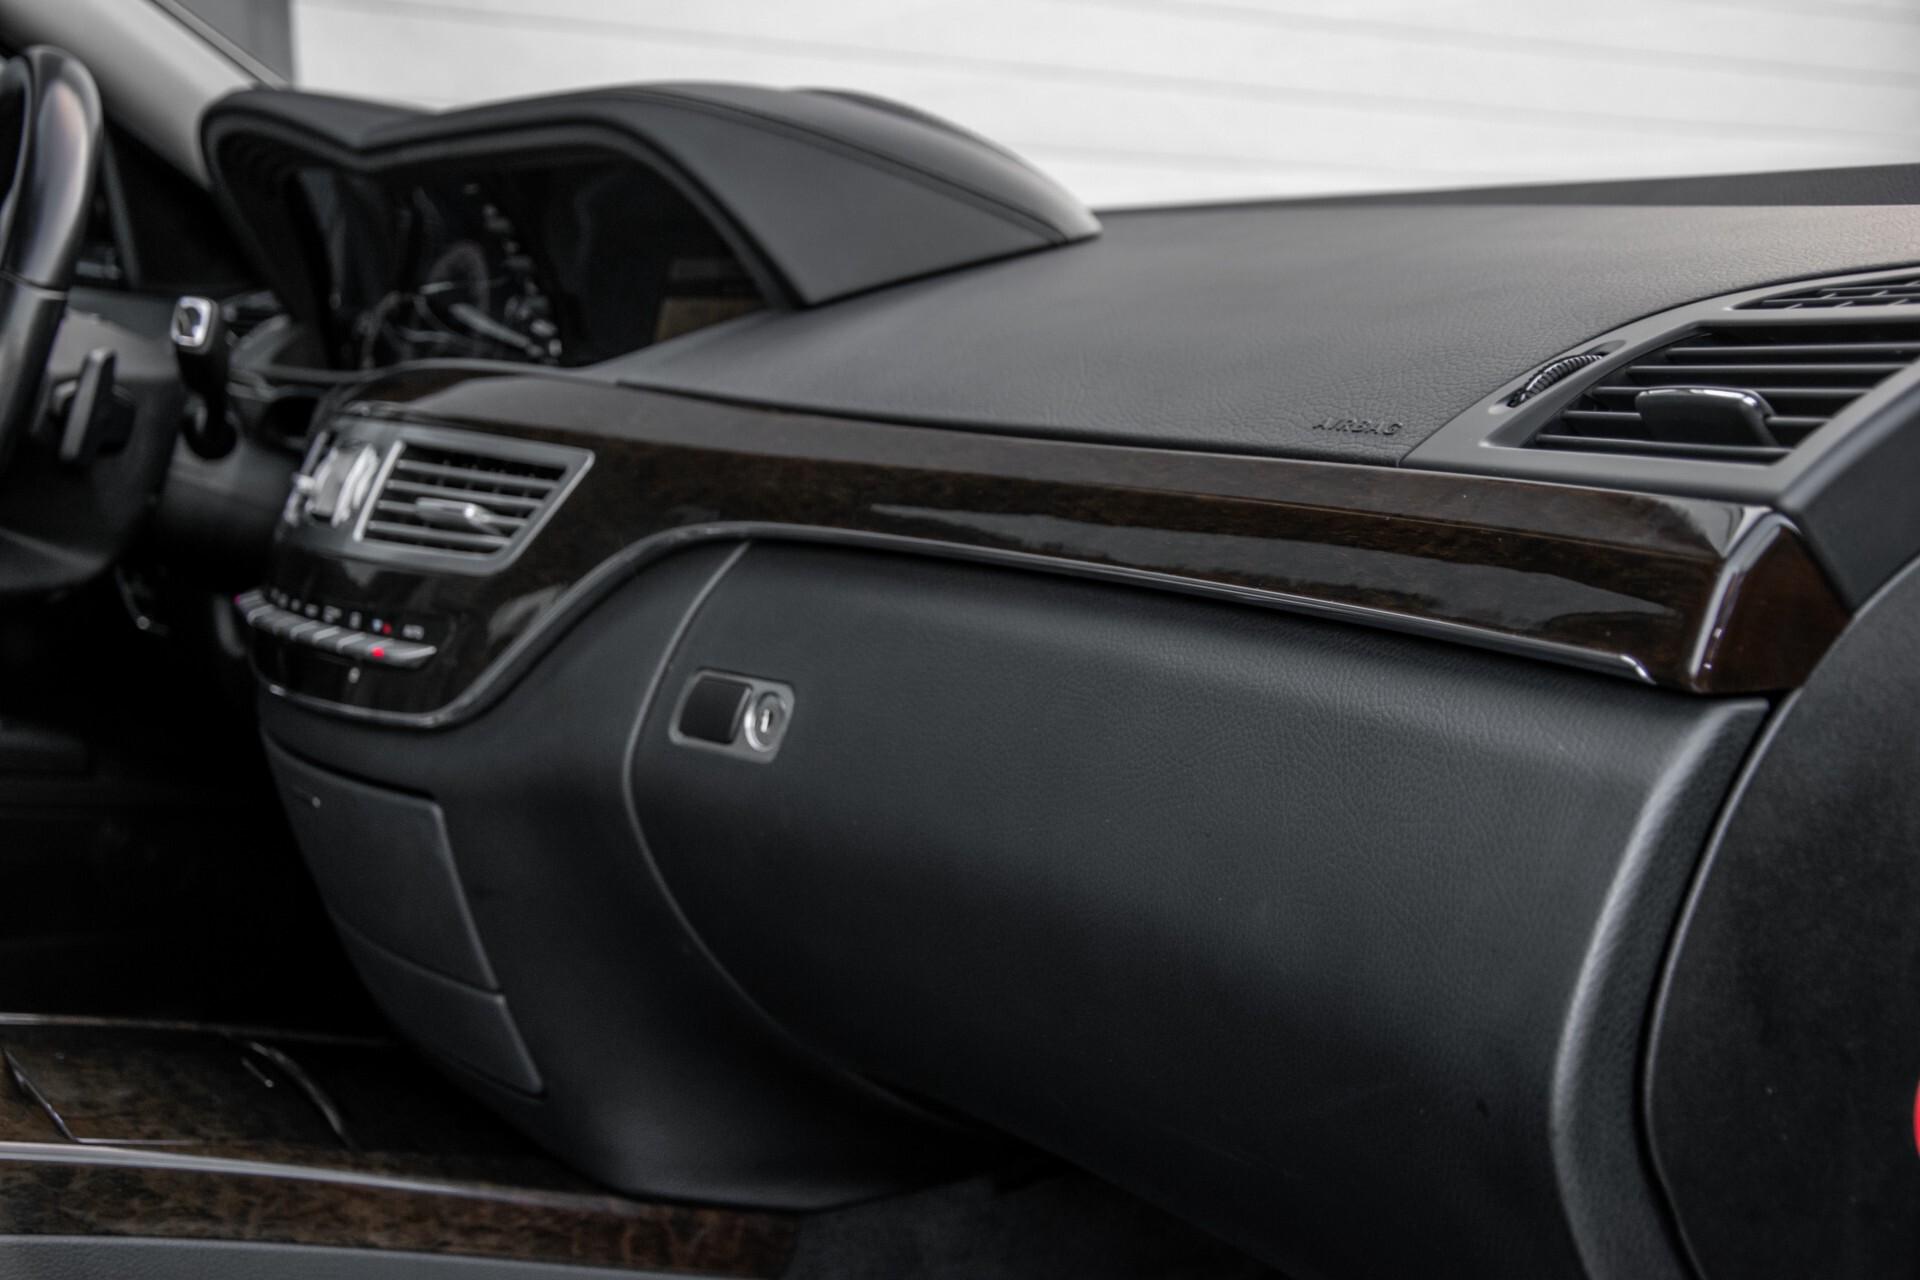 Mercedes-Benz S-Klasse 350 Bluetec Keyless/Distronic/Nightvision/Schuifdak/Harman-Kardon Aut7 Foto 46